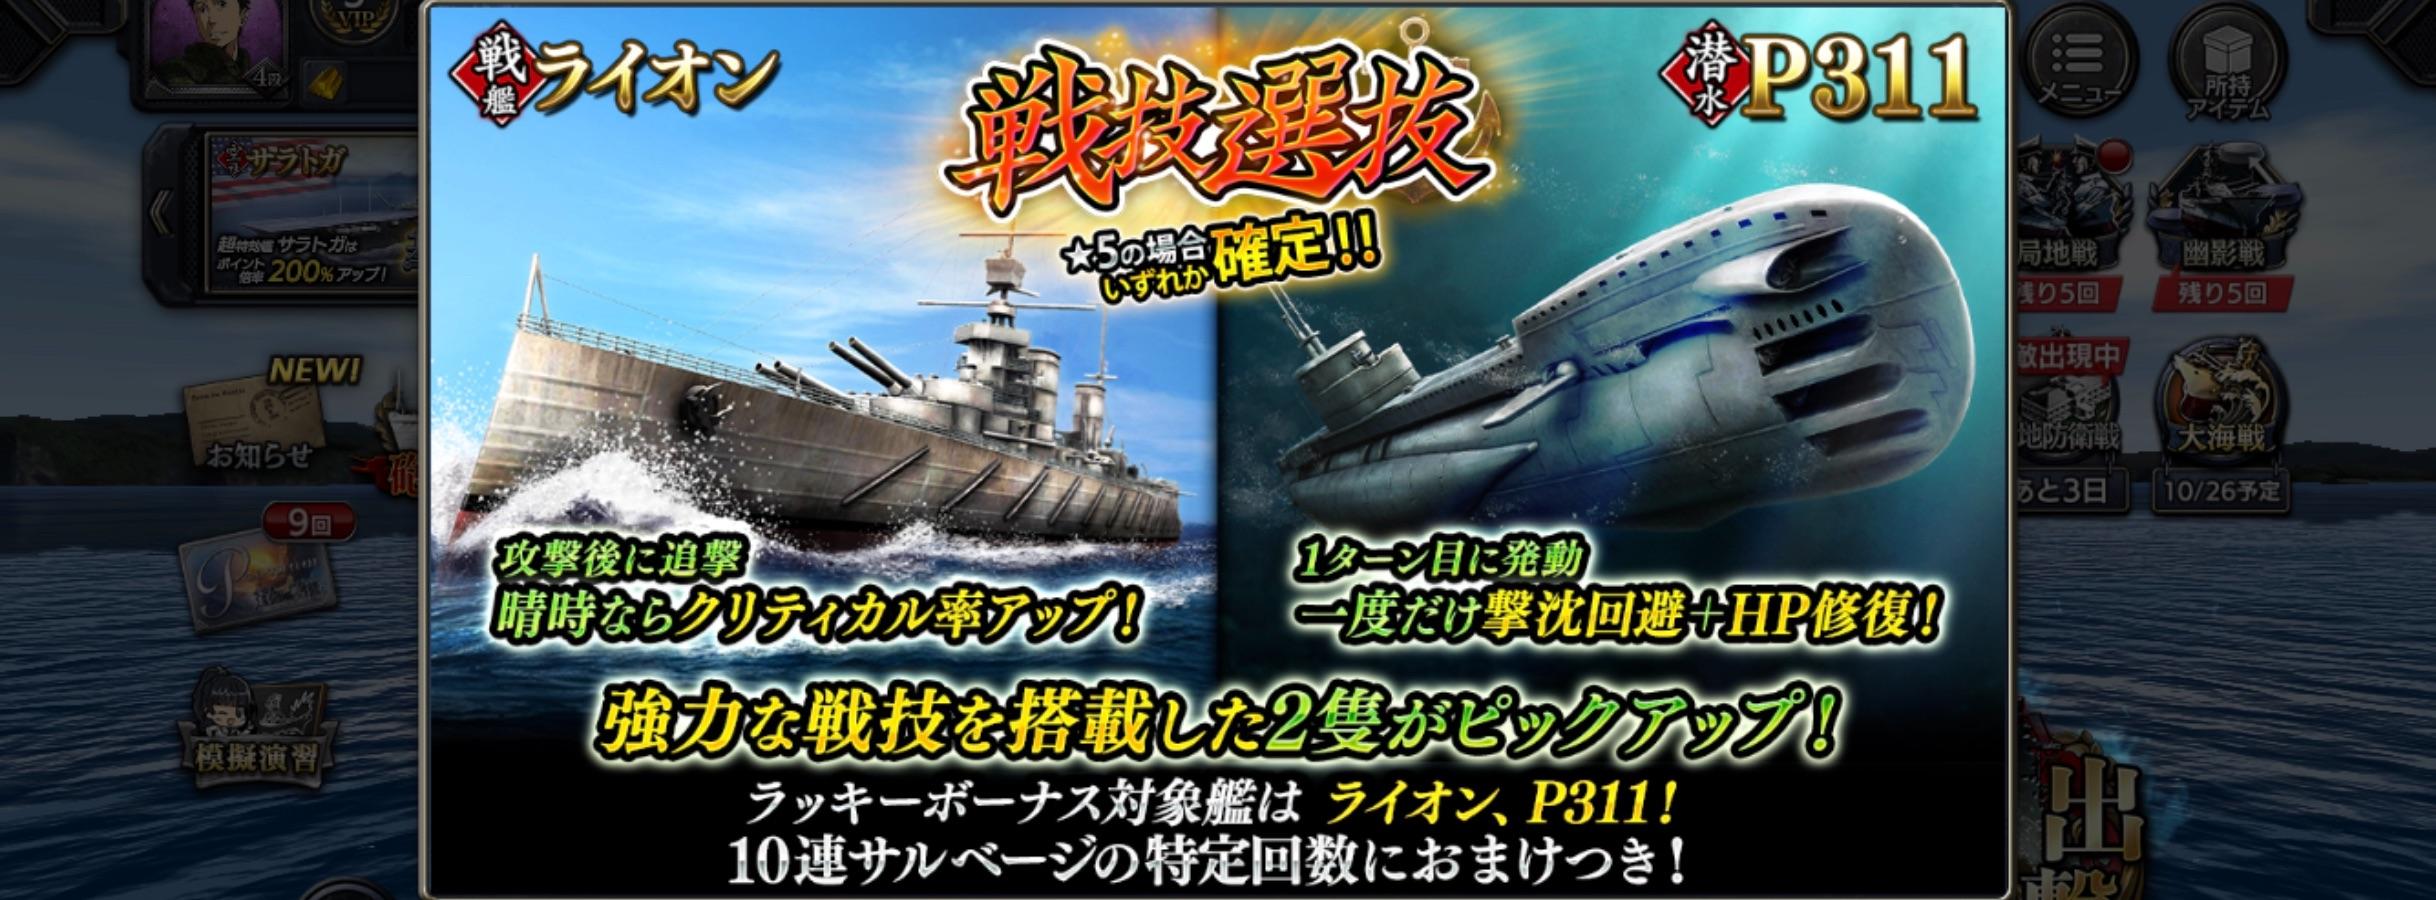 submarine-P311